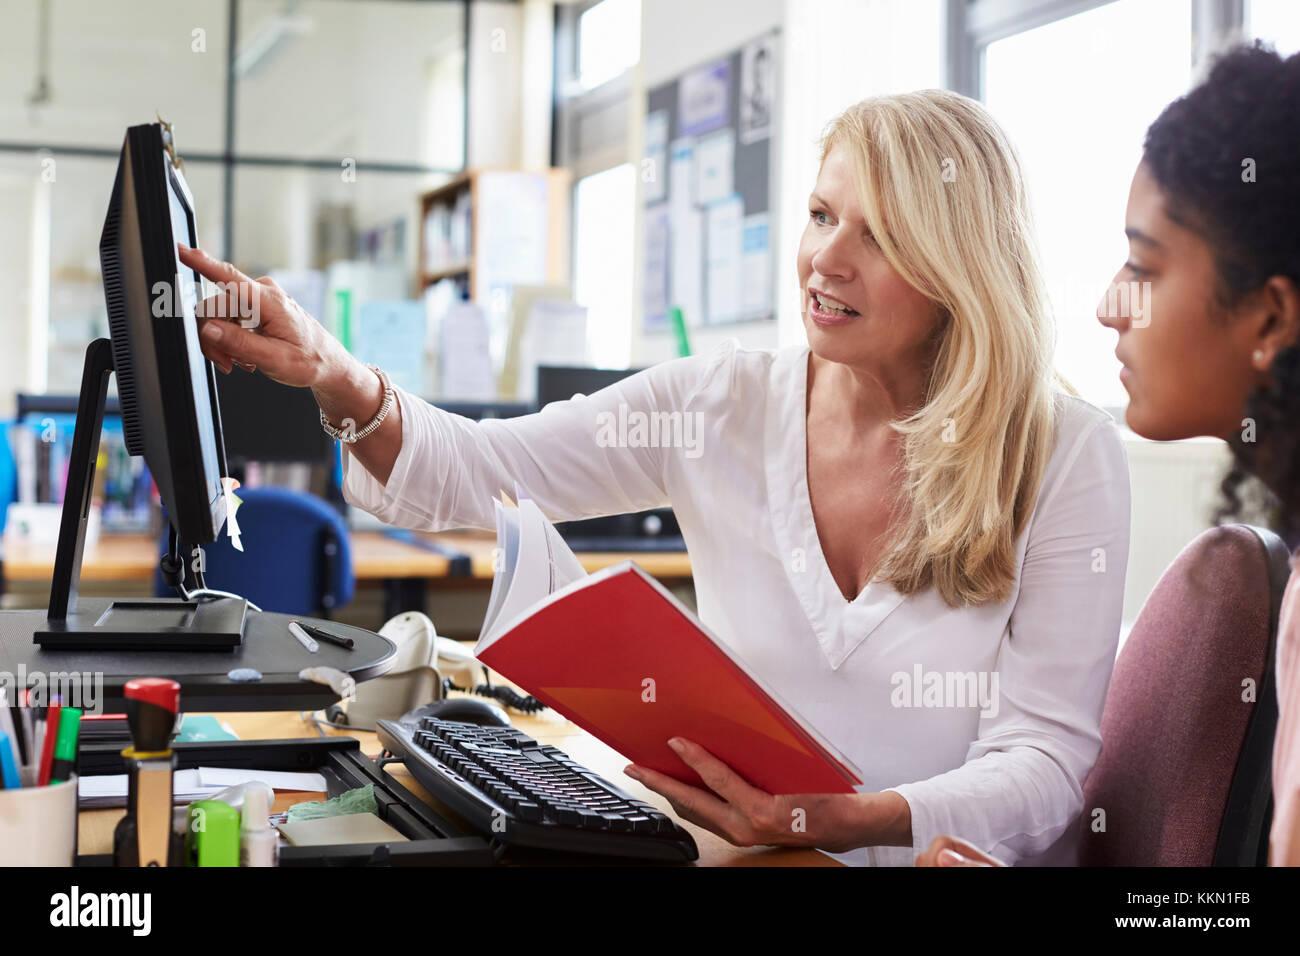 Careers Advisor Meeting Female College Student - Stock Image